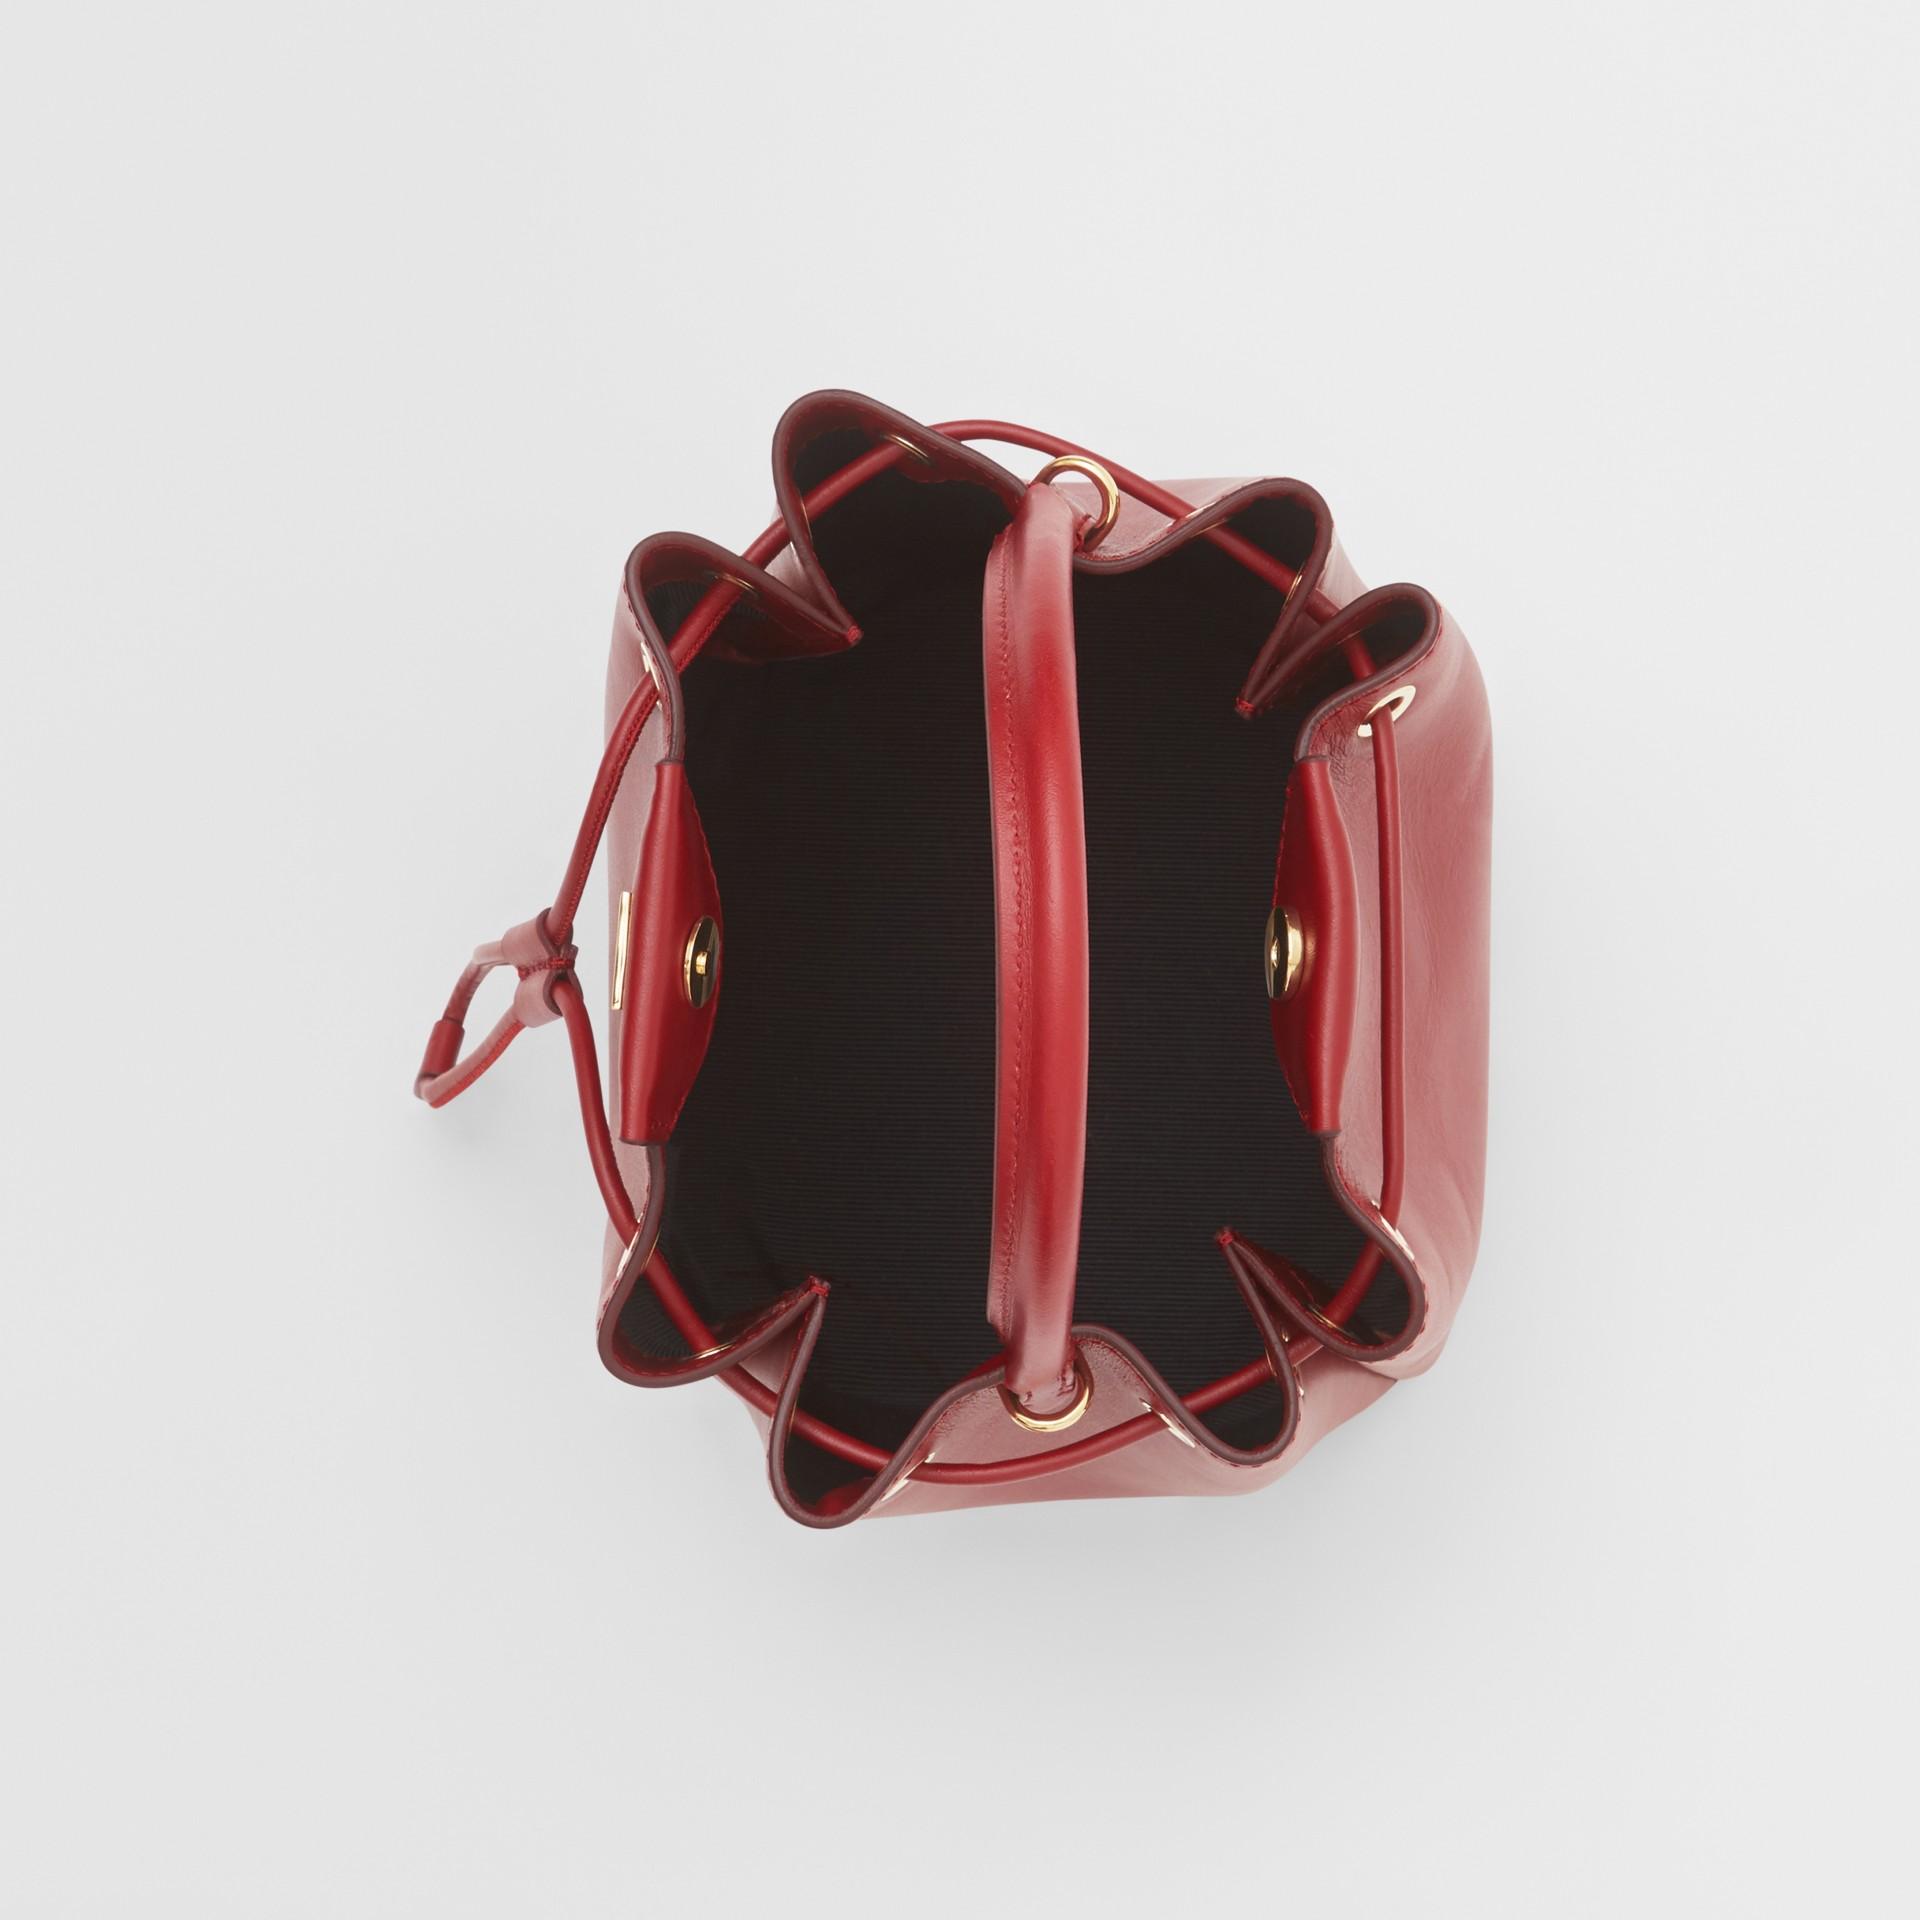 Monogram Motif Leather Bucket Bag in Dark Carmine - Women | Burberry United States - gallery image 3